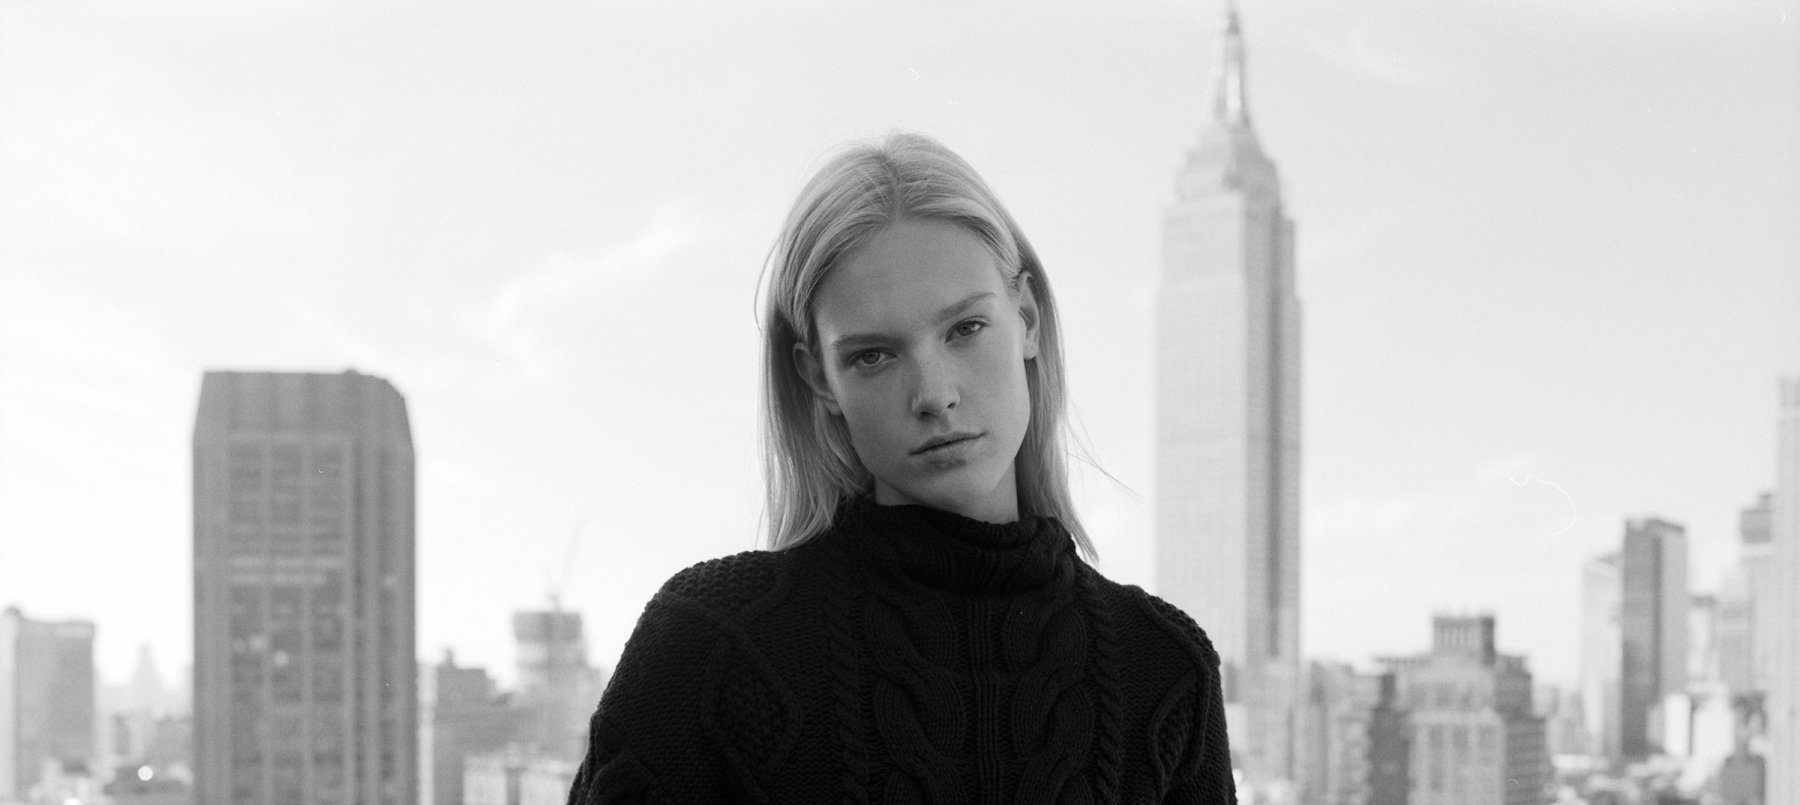 Charlene Högger by J. Konrad Schmidt